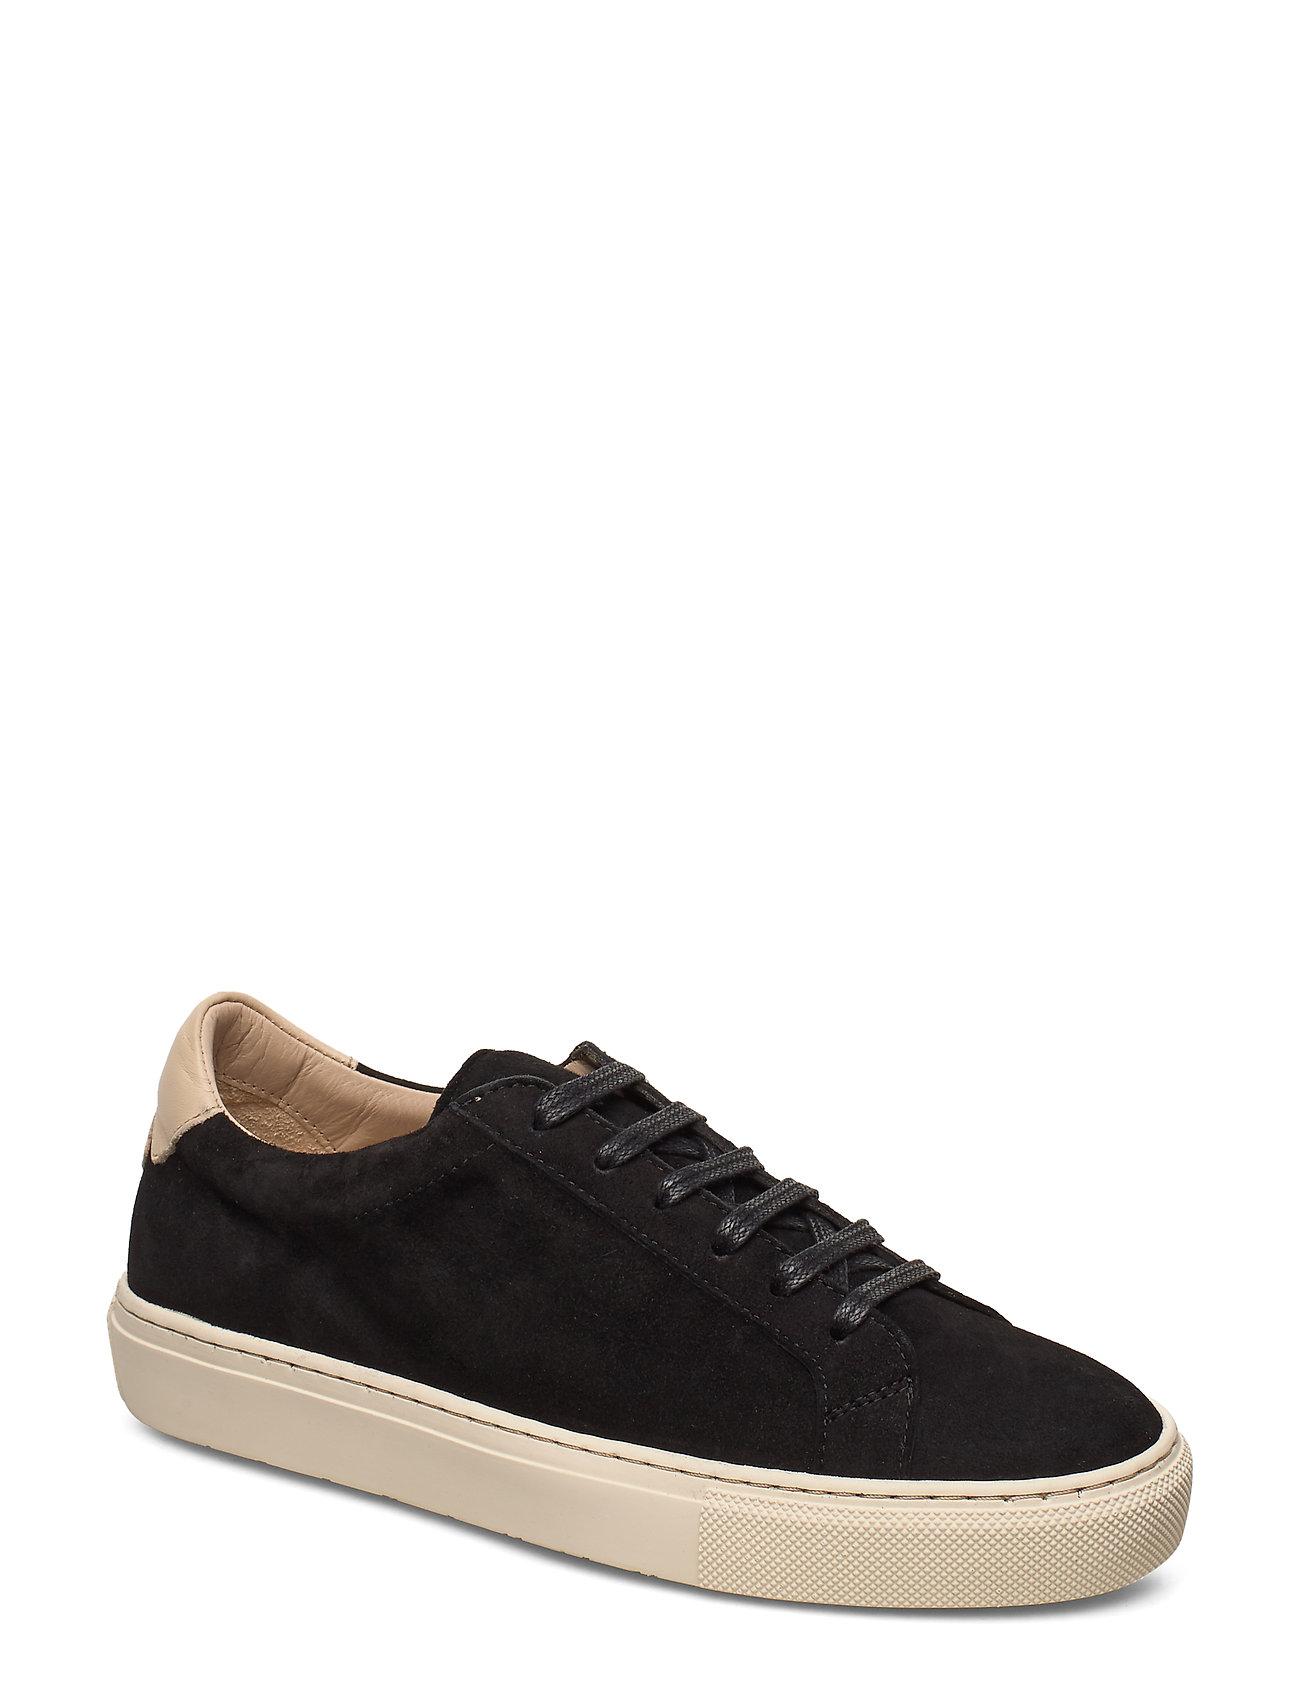 Image of Zarah Low-top Sneakers Sort By Malene Birger (3351889963)